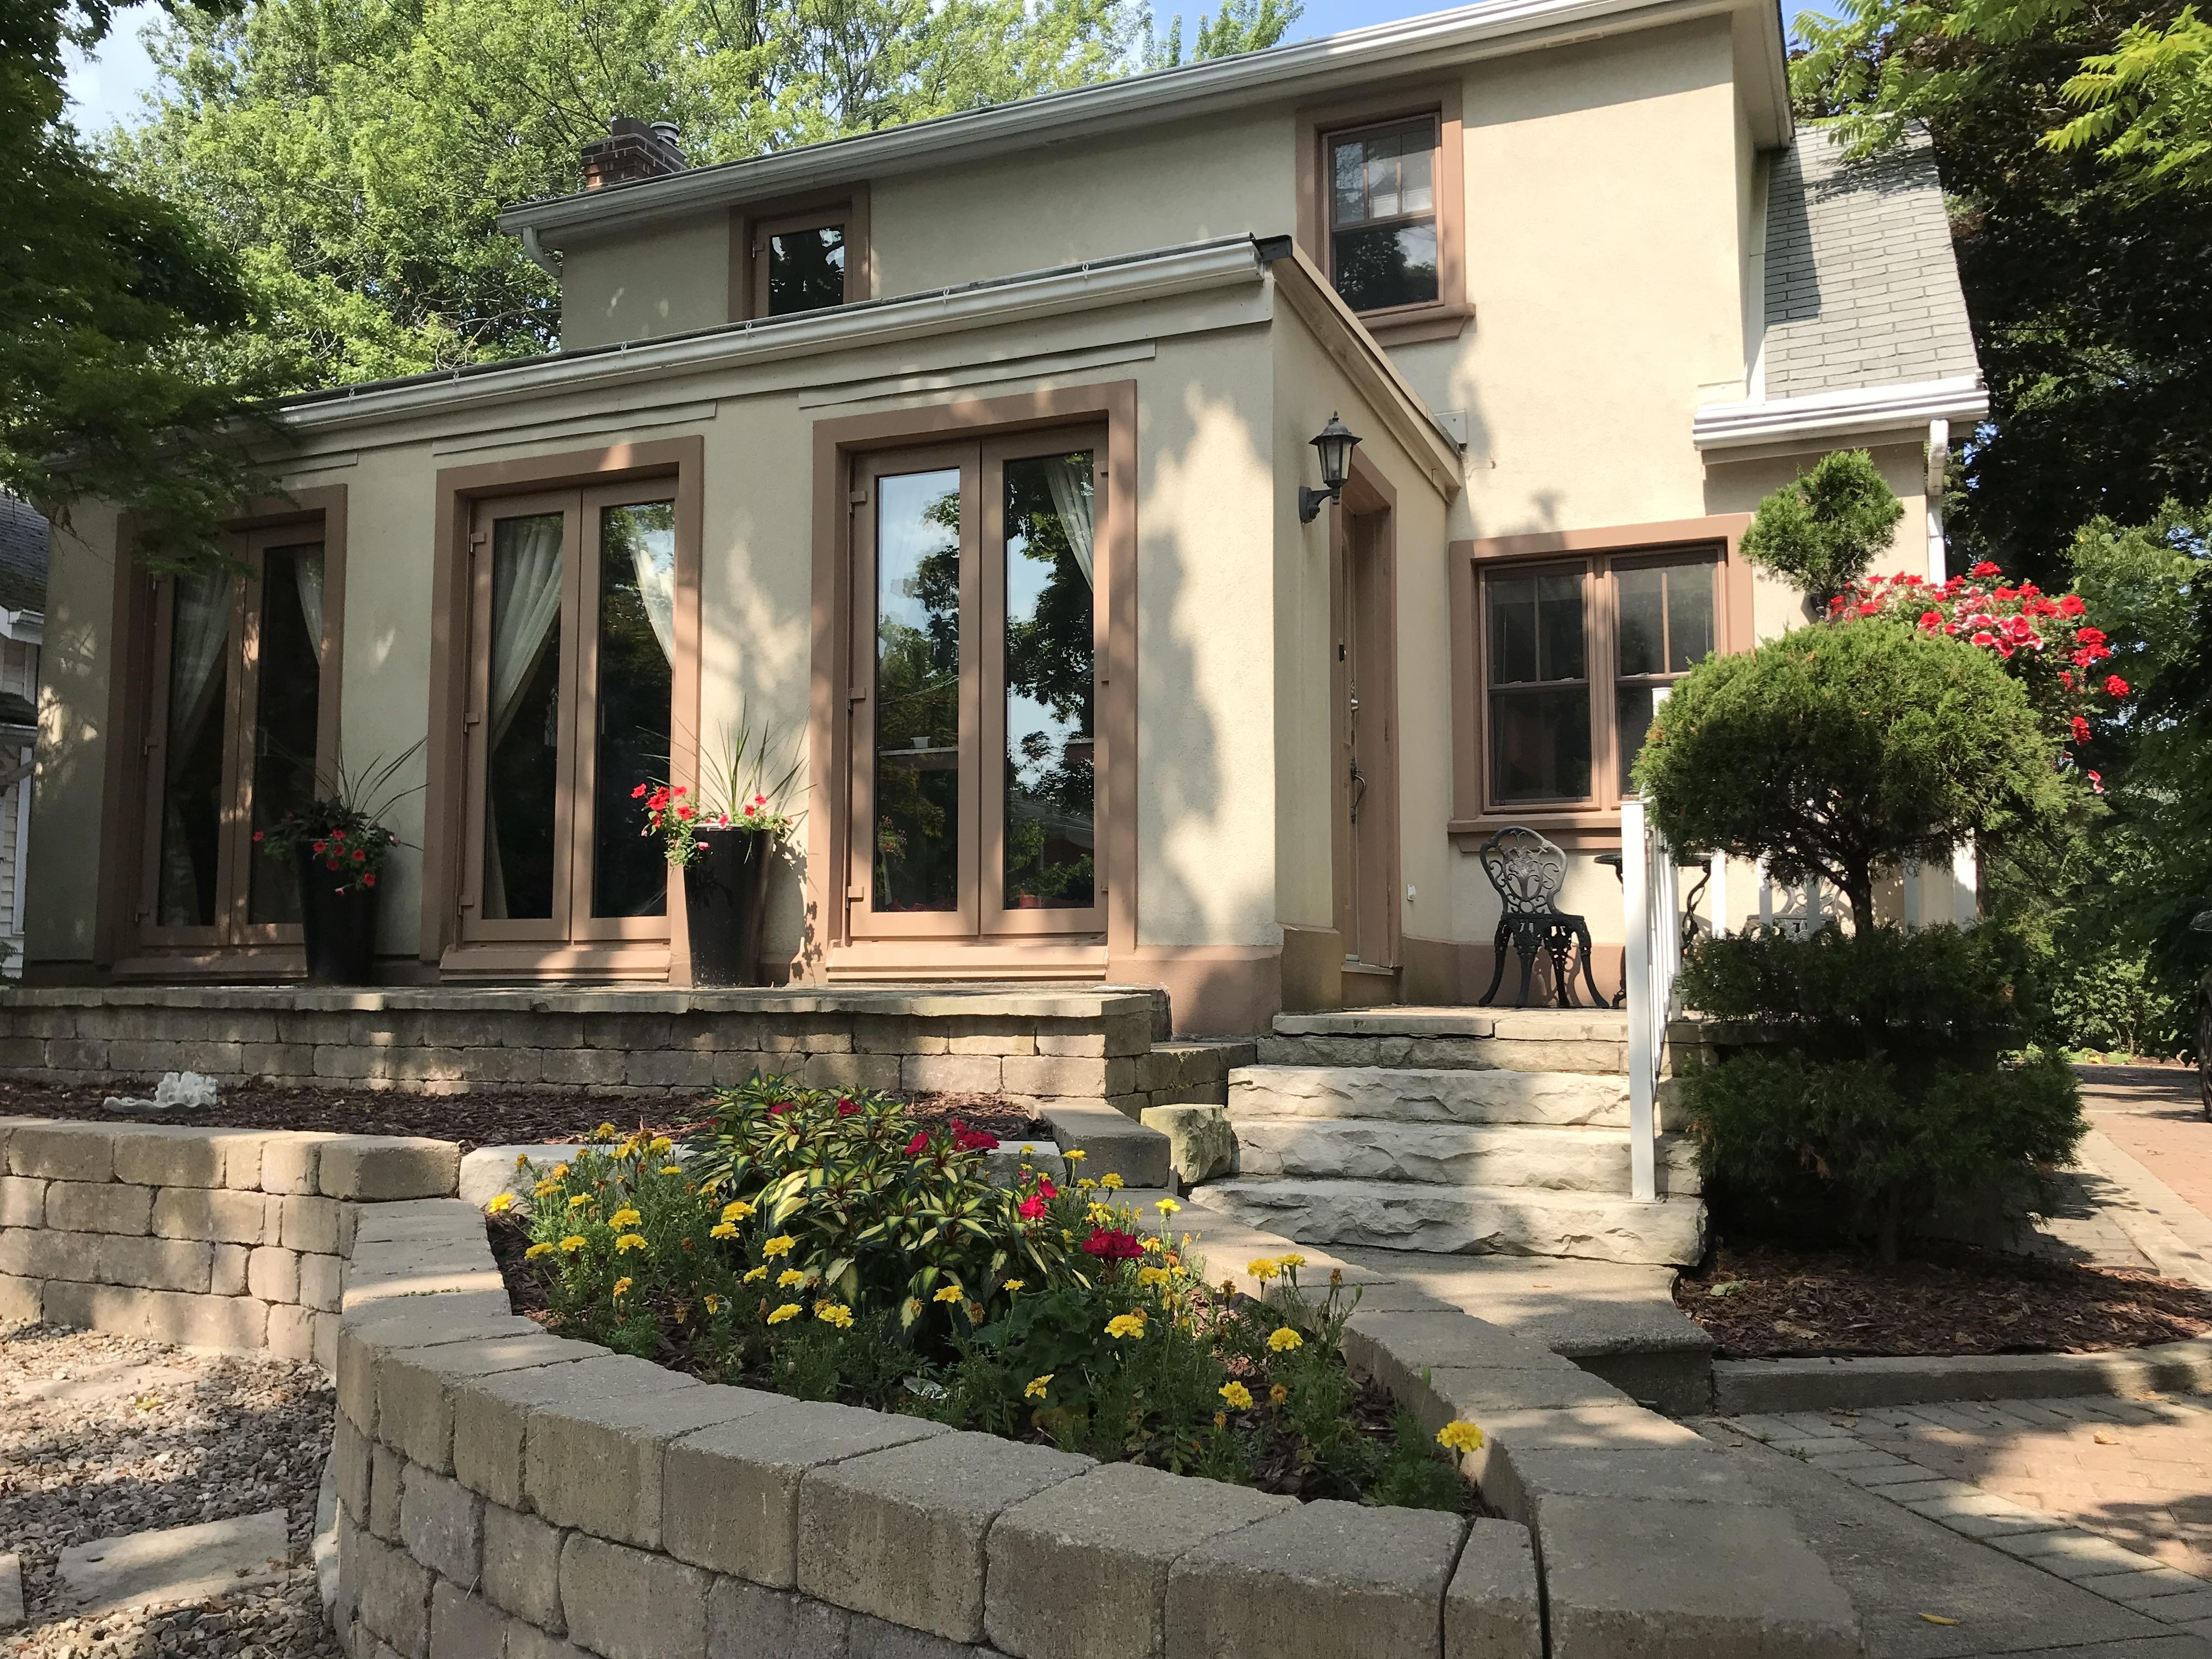 Victoria House | Niagara-on-the-Lake Vacation Rentals